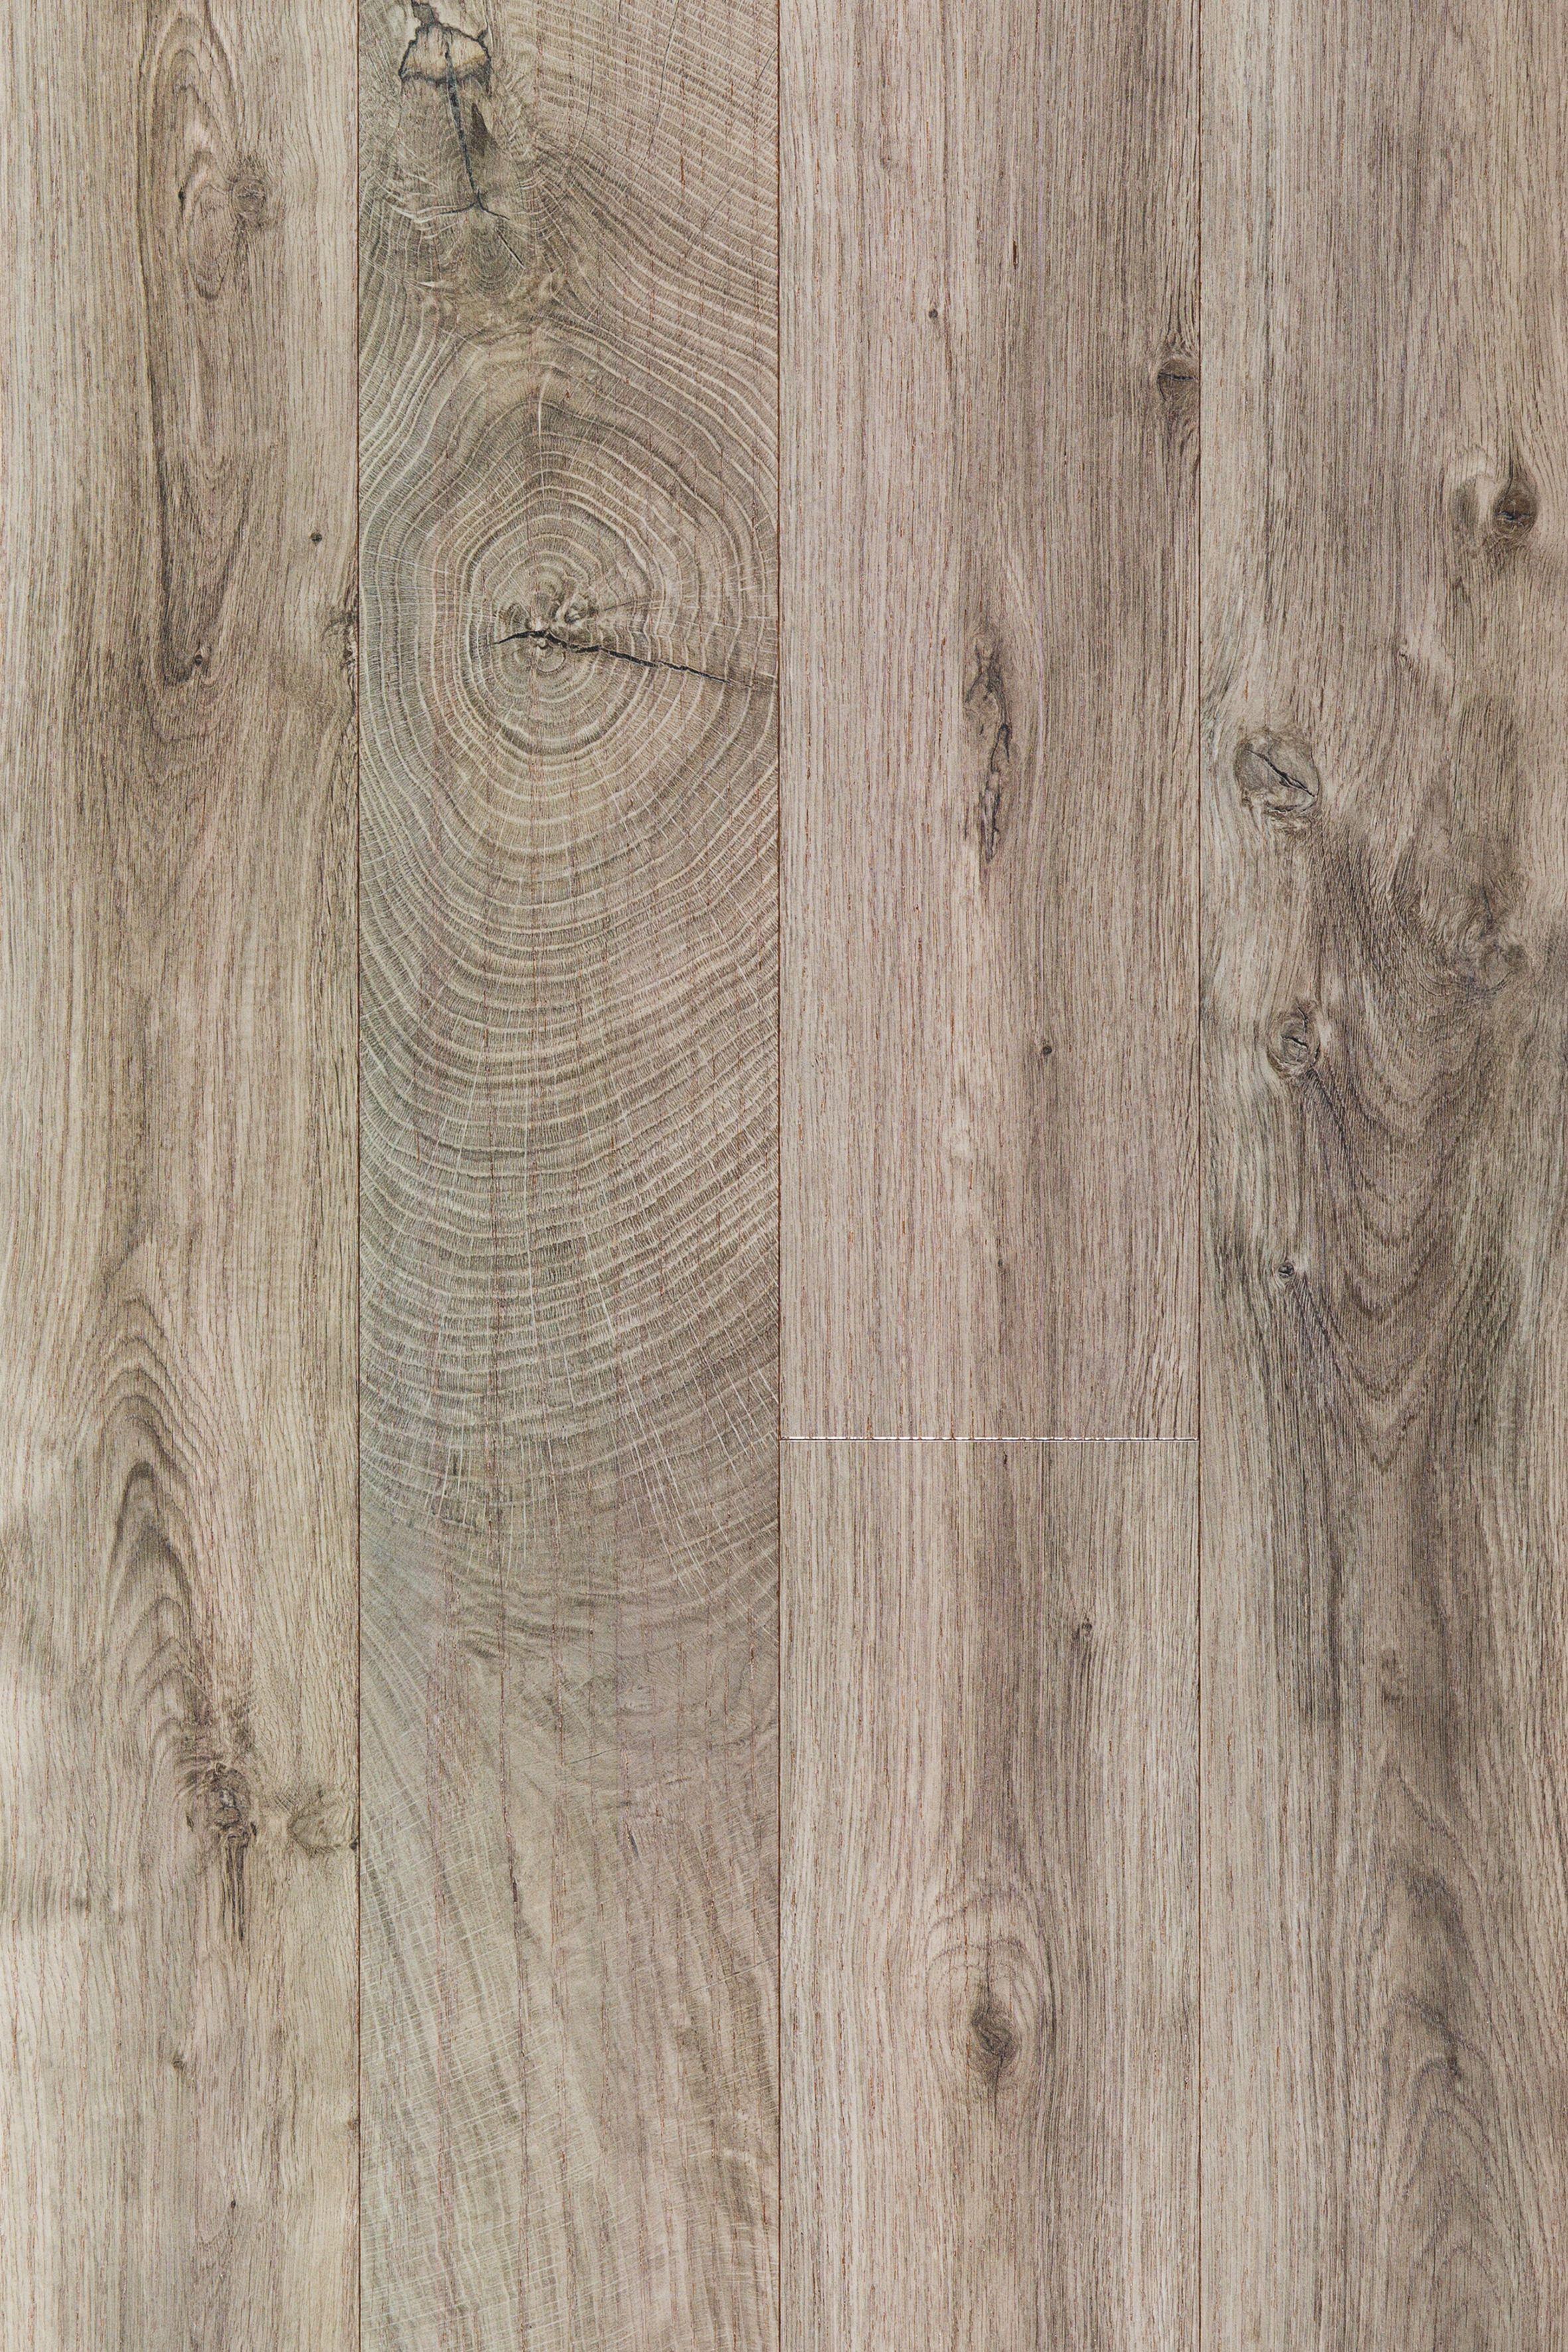 19 005 Furnierboden Eiche Grau Hirnholz Boden Furnier Holz